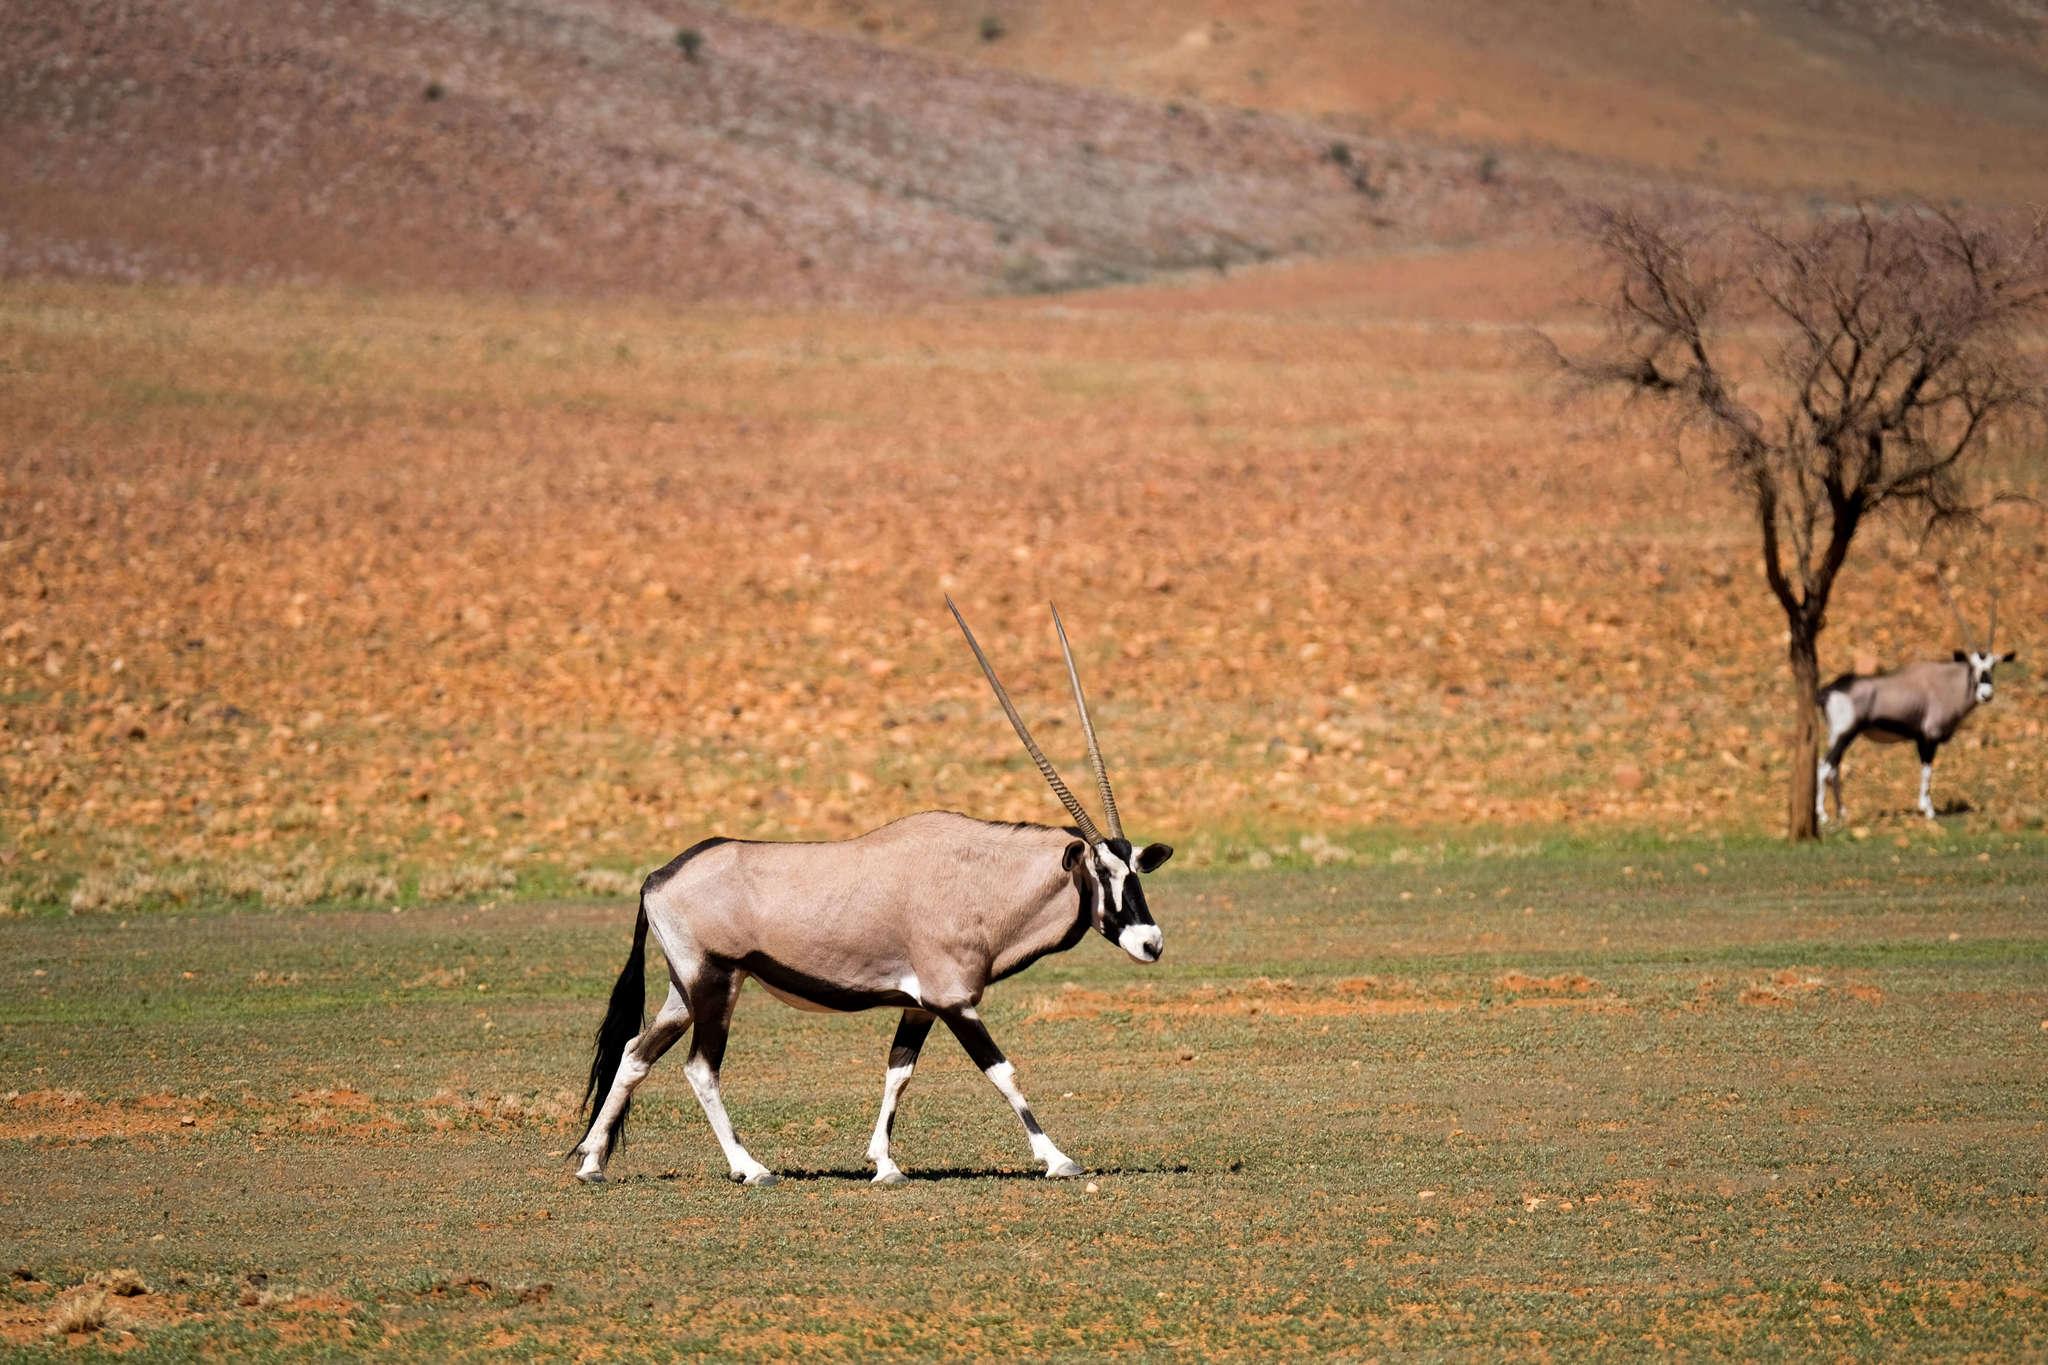 wolwedans dunes lodge game drive antelope